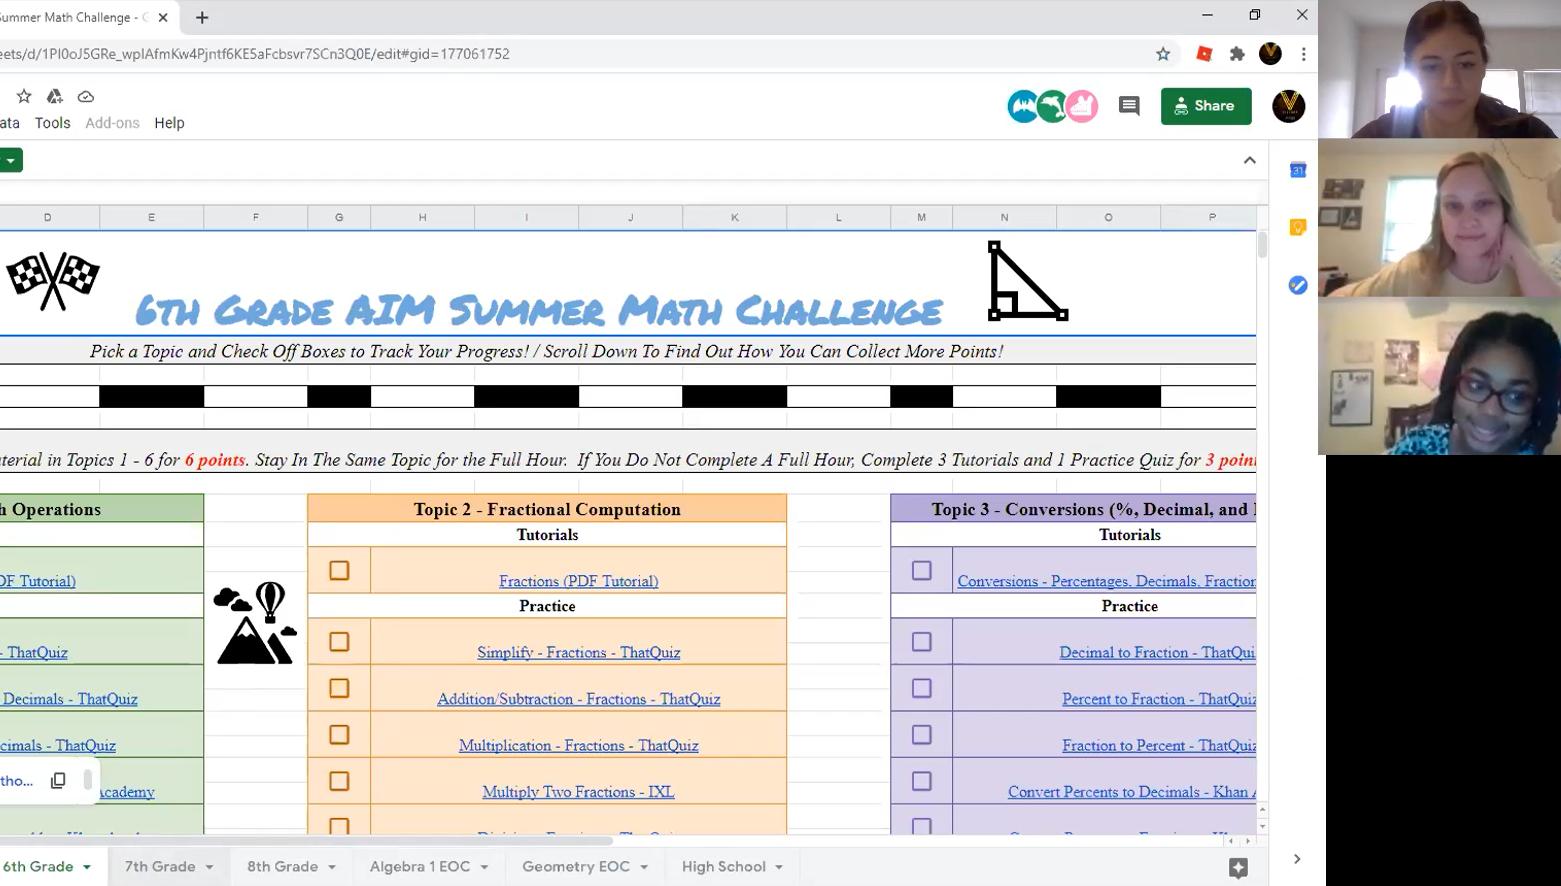 AIM Math Challenge Image 2